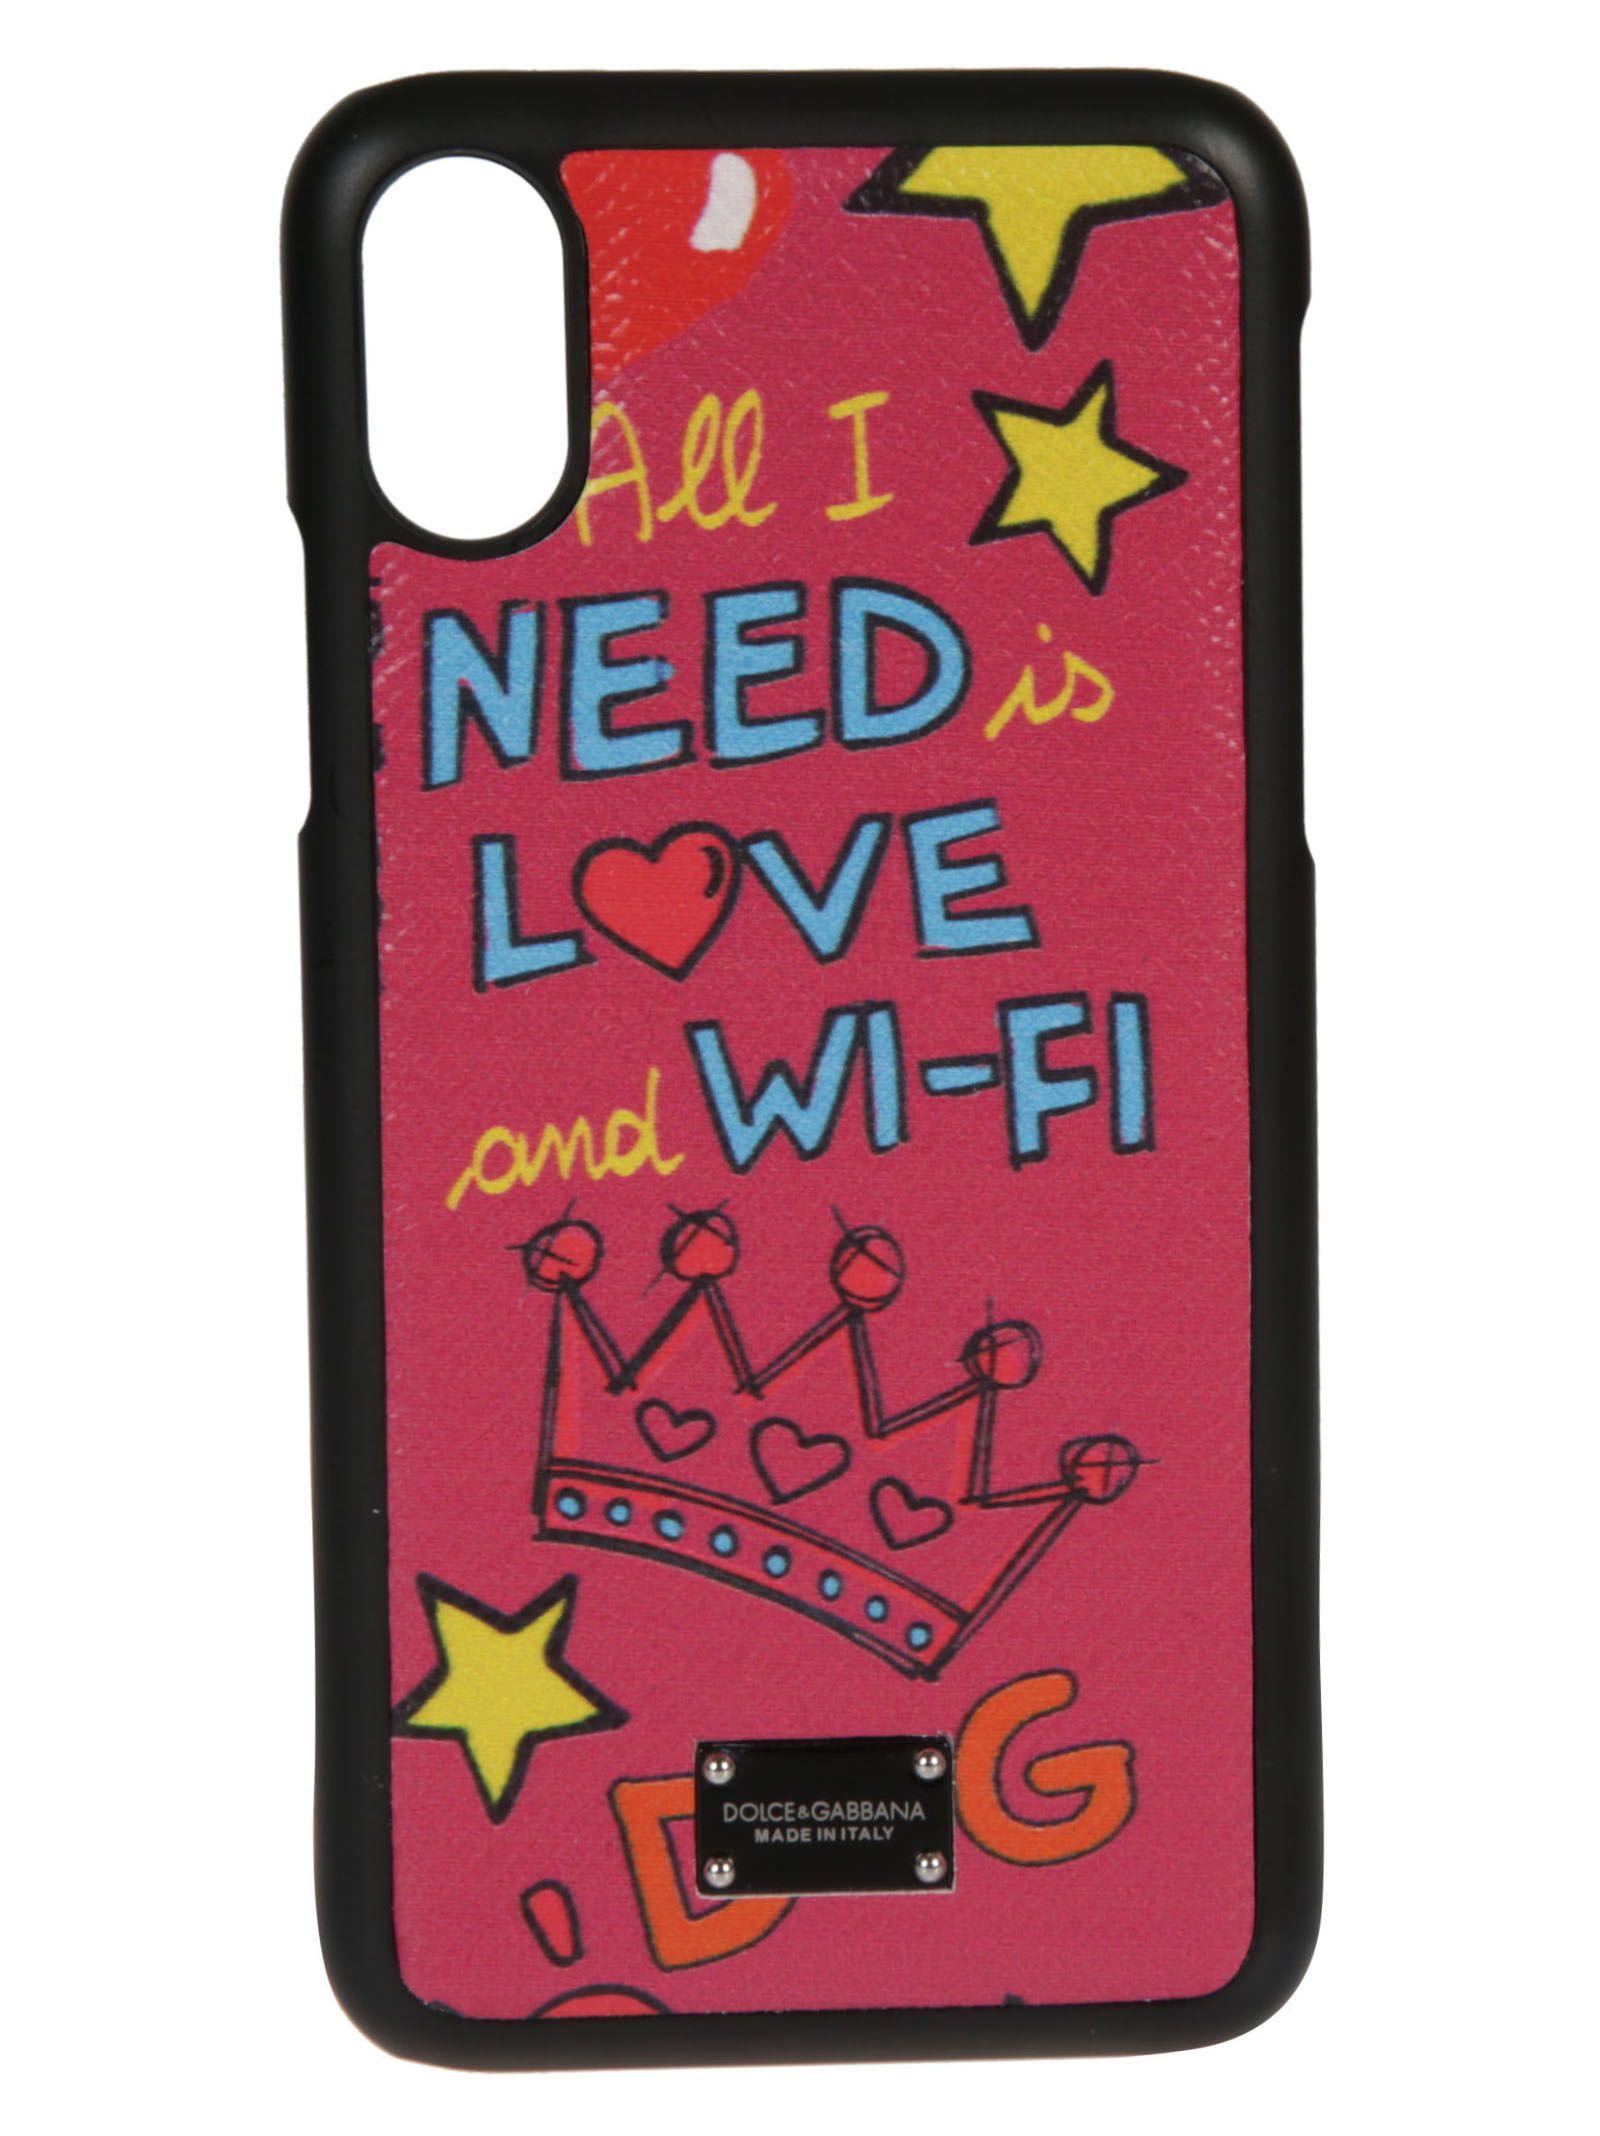 Dolce & Gabbana Printed Iphone X Case